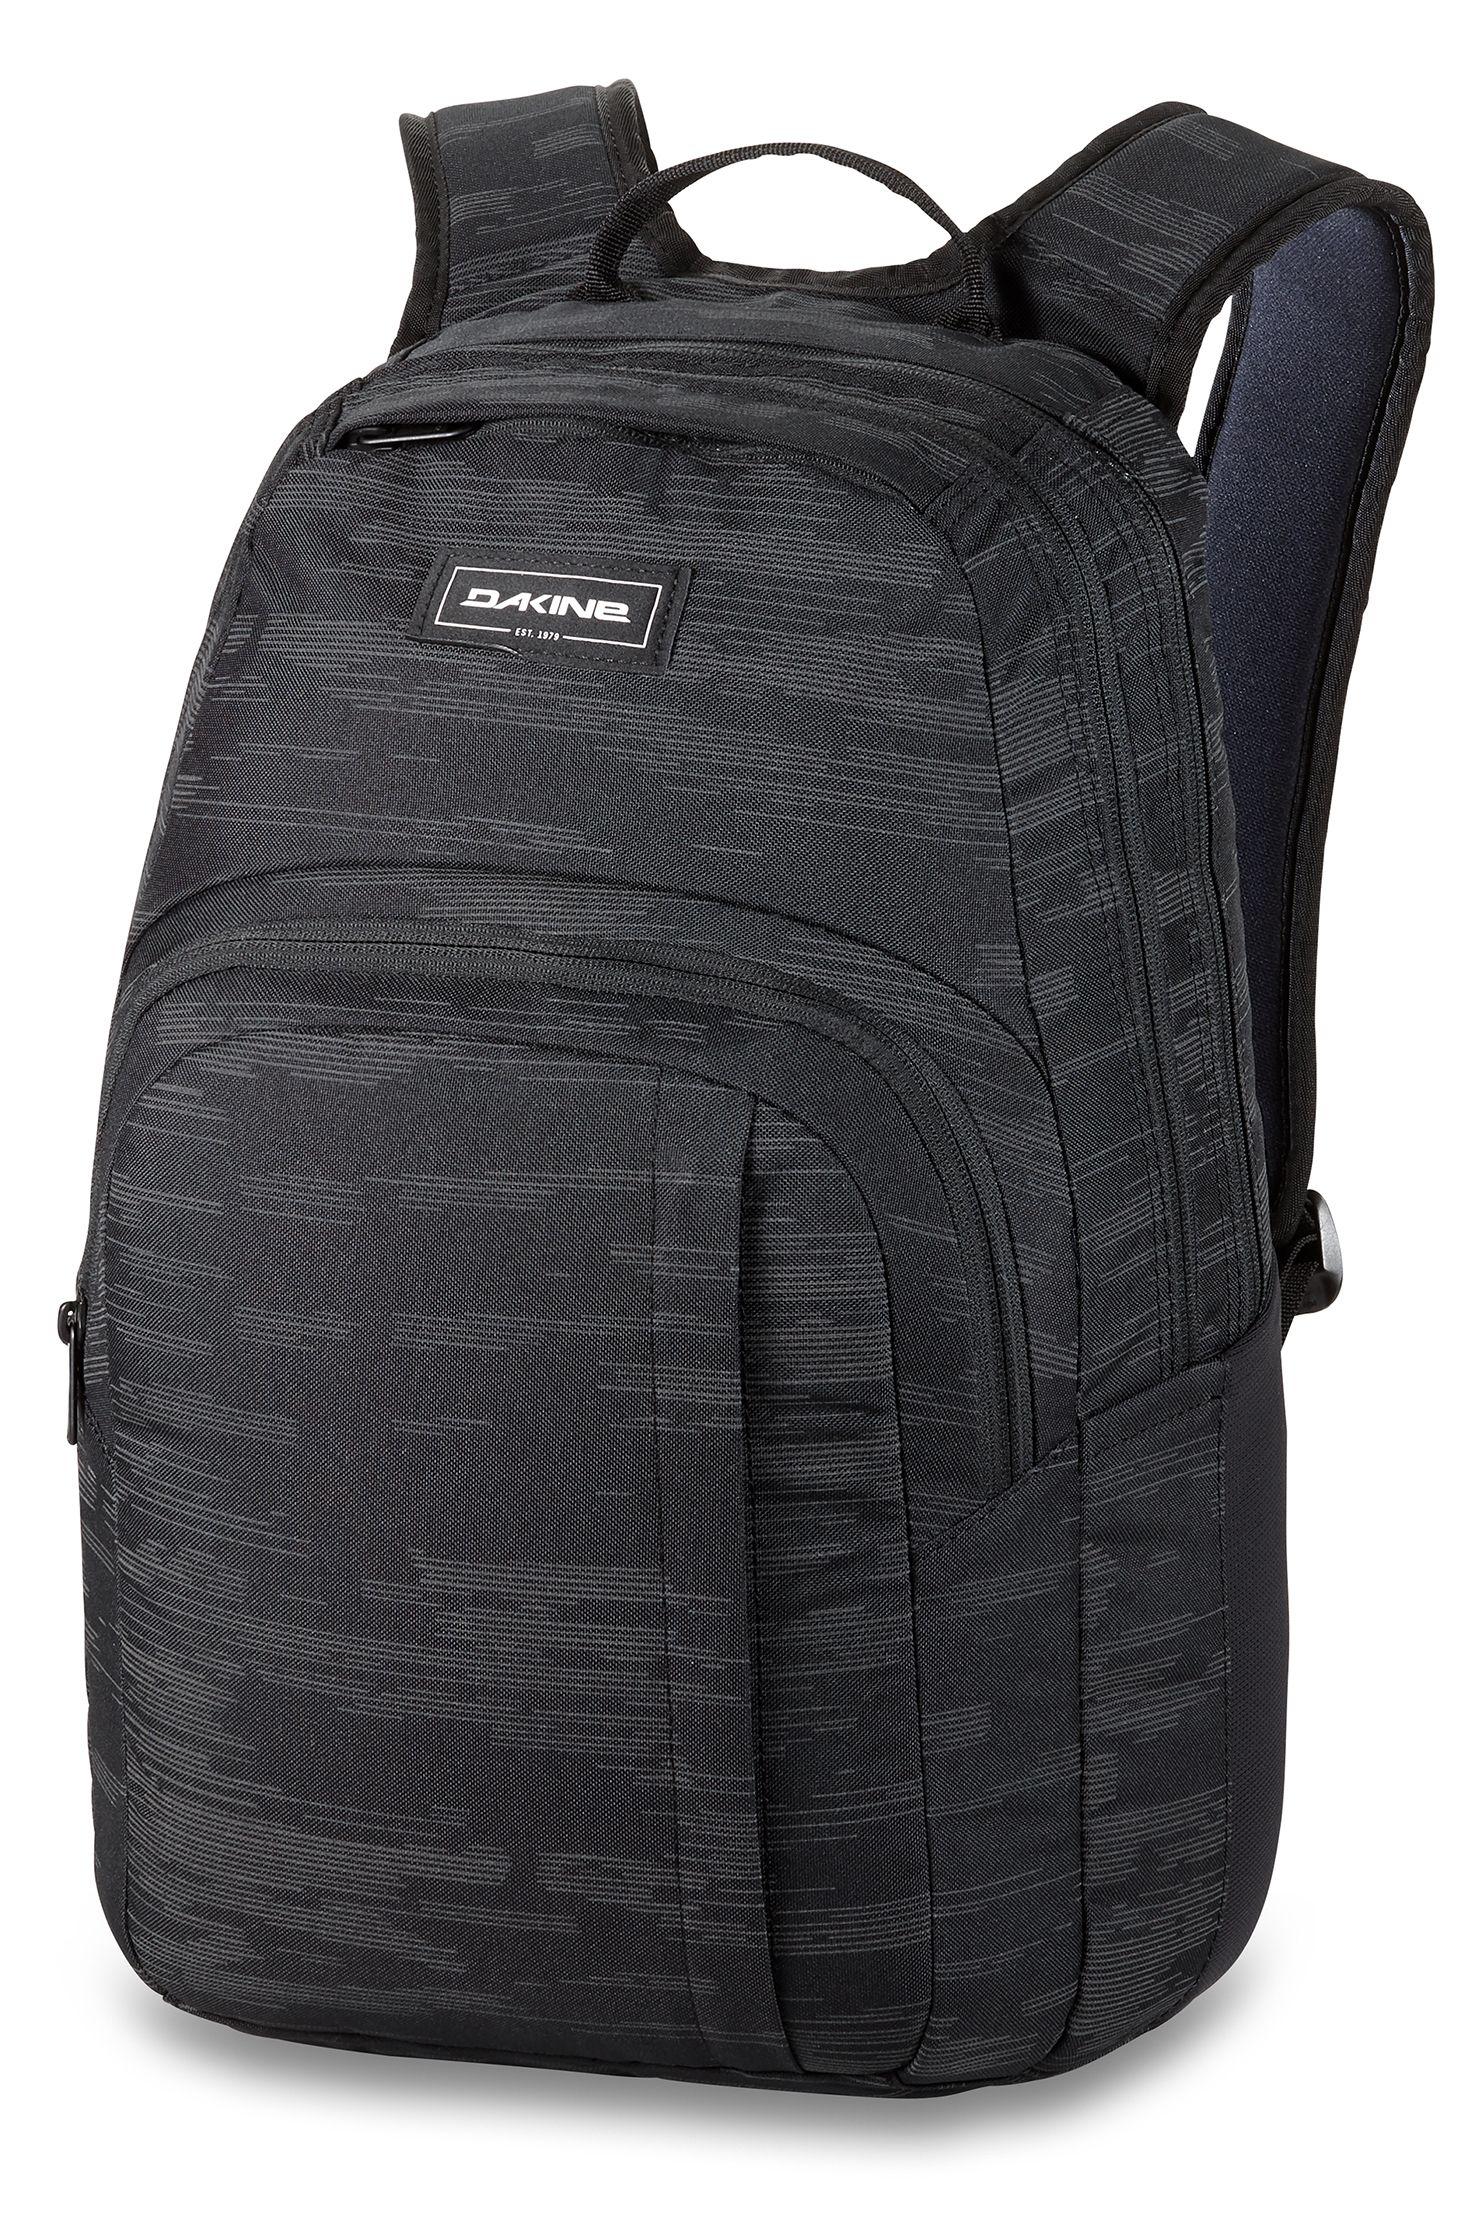 Dakine Backpack CAMPUS M 25L Flash Reflective